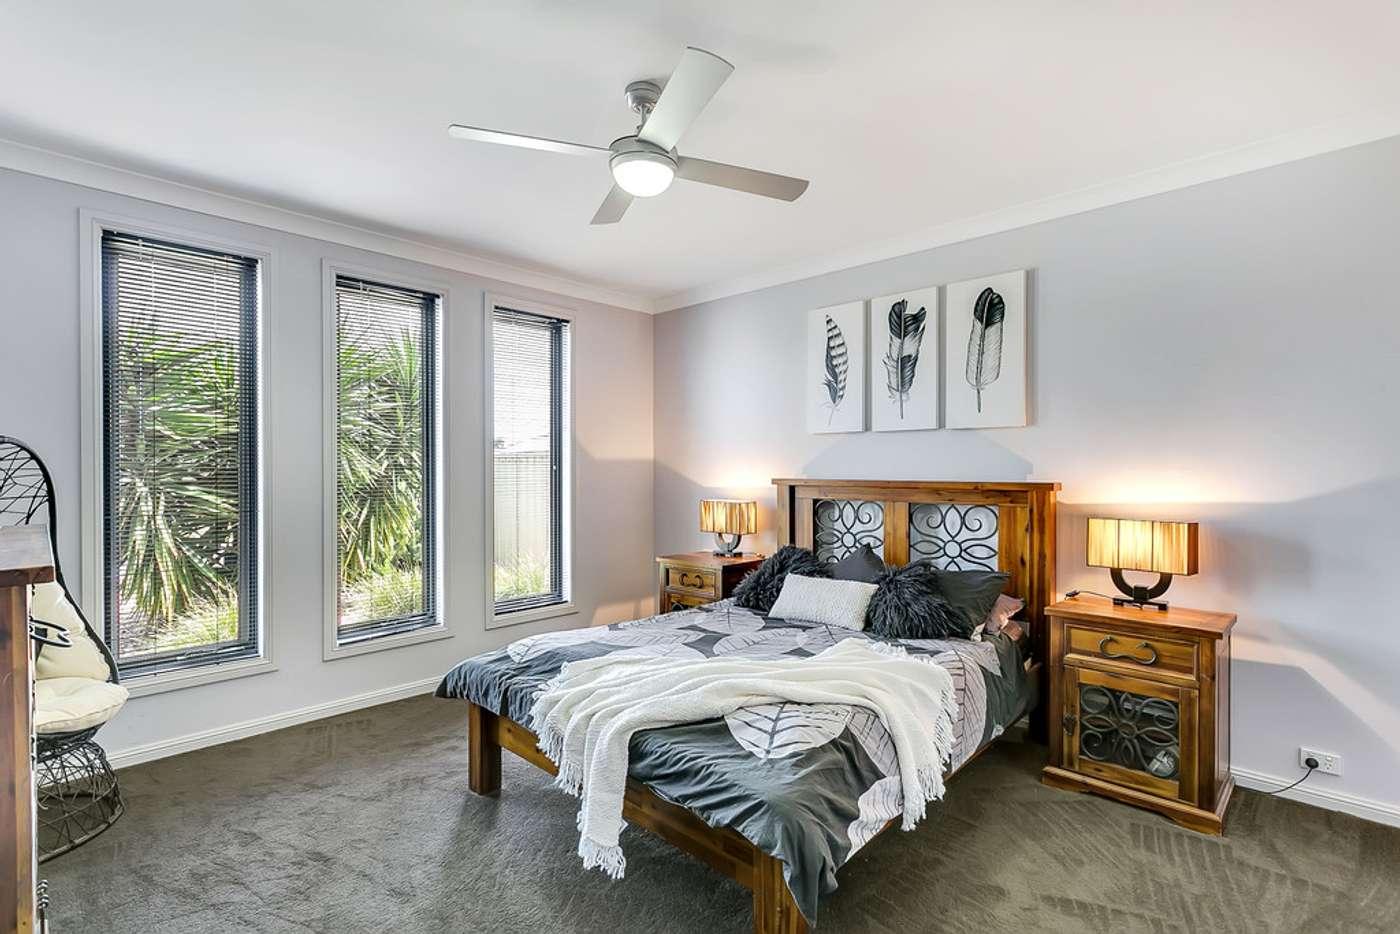 Sixth view of Homely house listing, 5 Toucan Loop, Aldinga Beach SA 5173